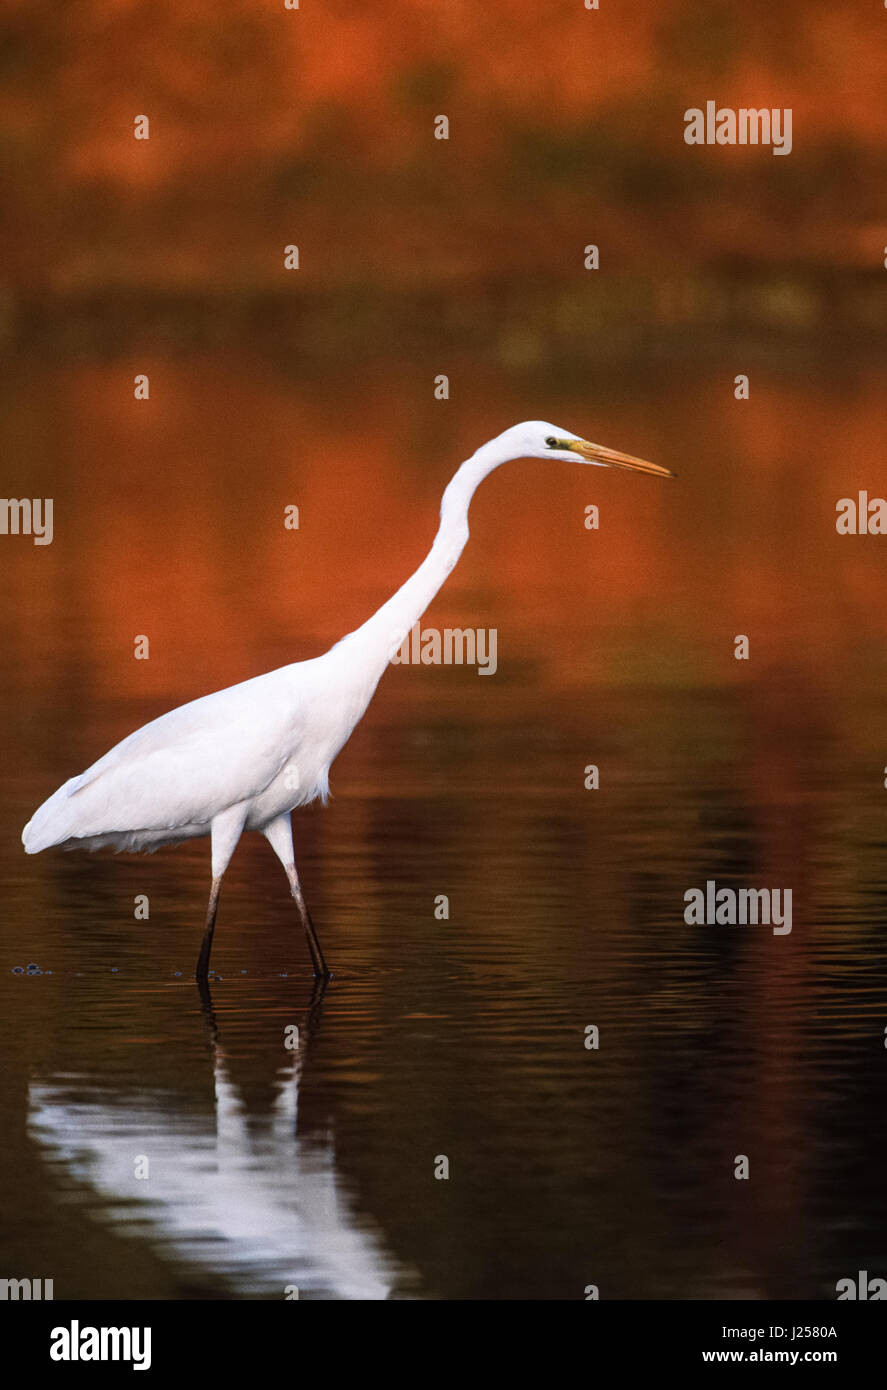 Great Egret, (Ardea alba), fishing in wetlands, Keoladeo Ghana National Park, Bharatpur, Rajasthan, India - Stock Image